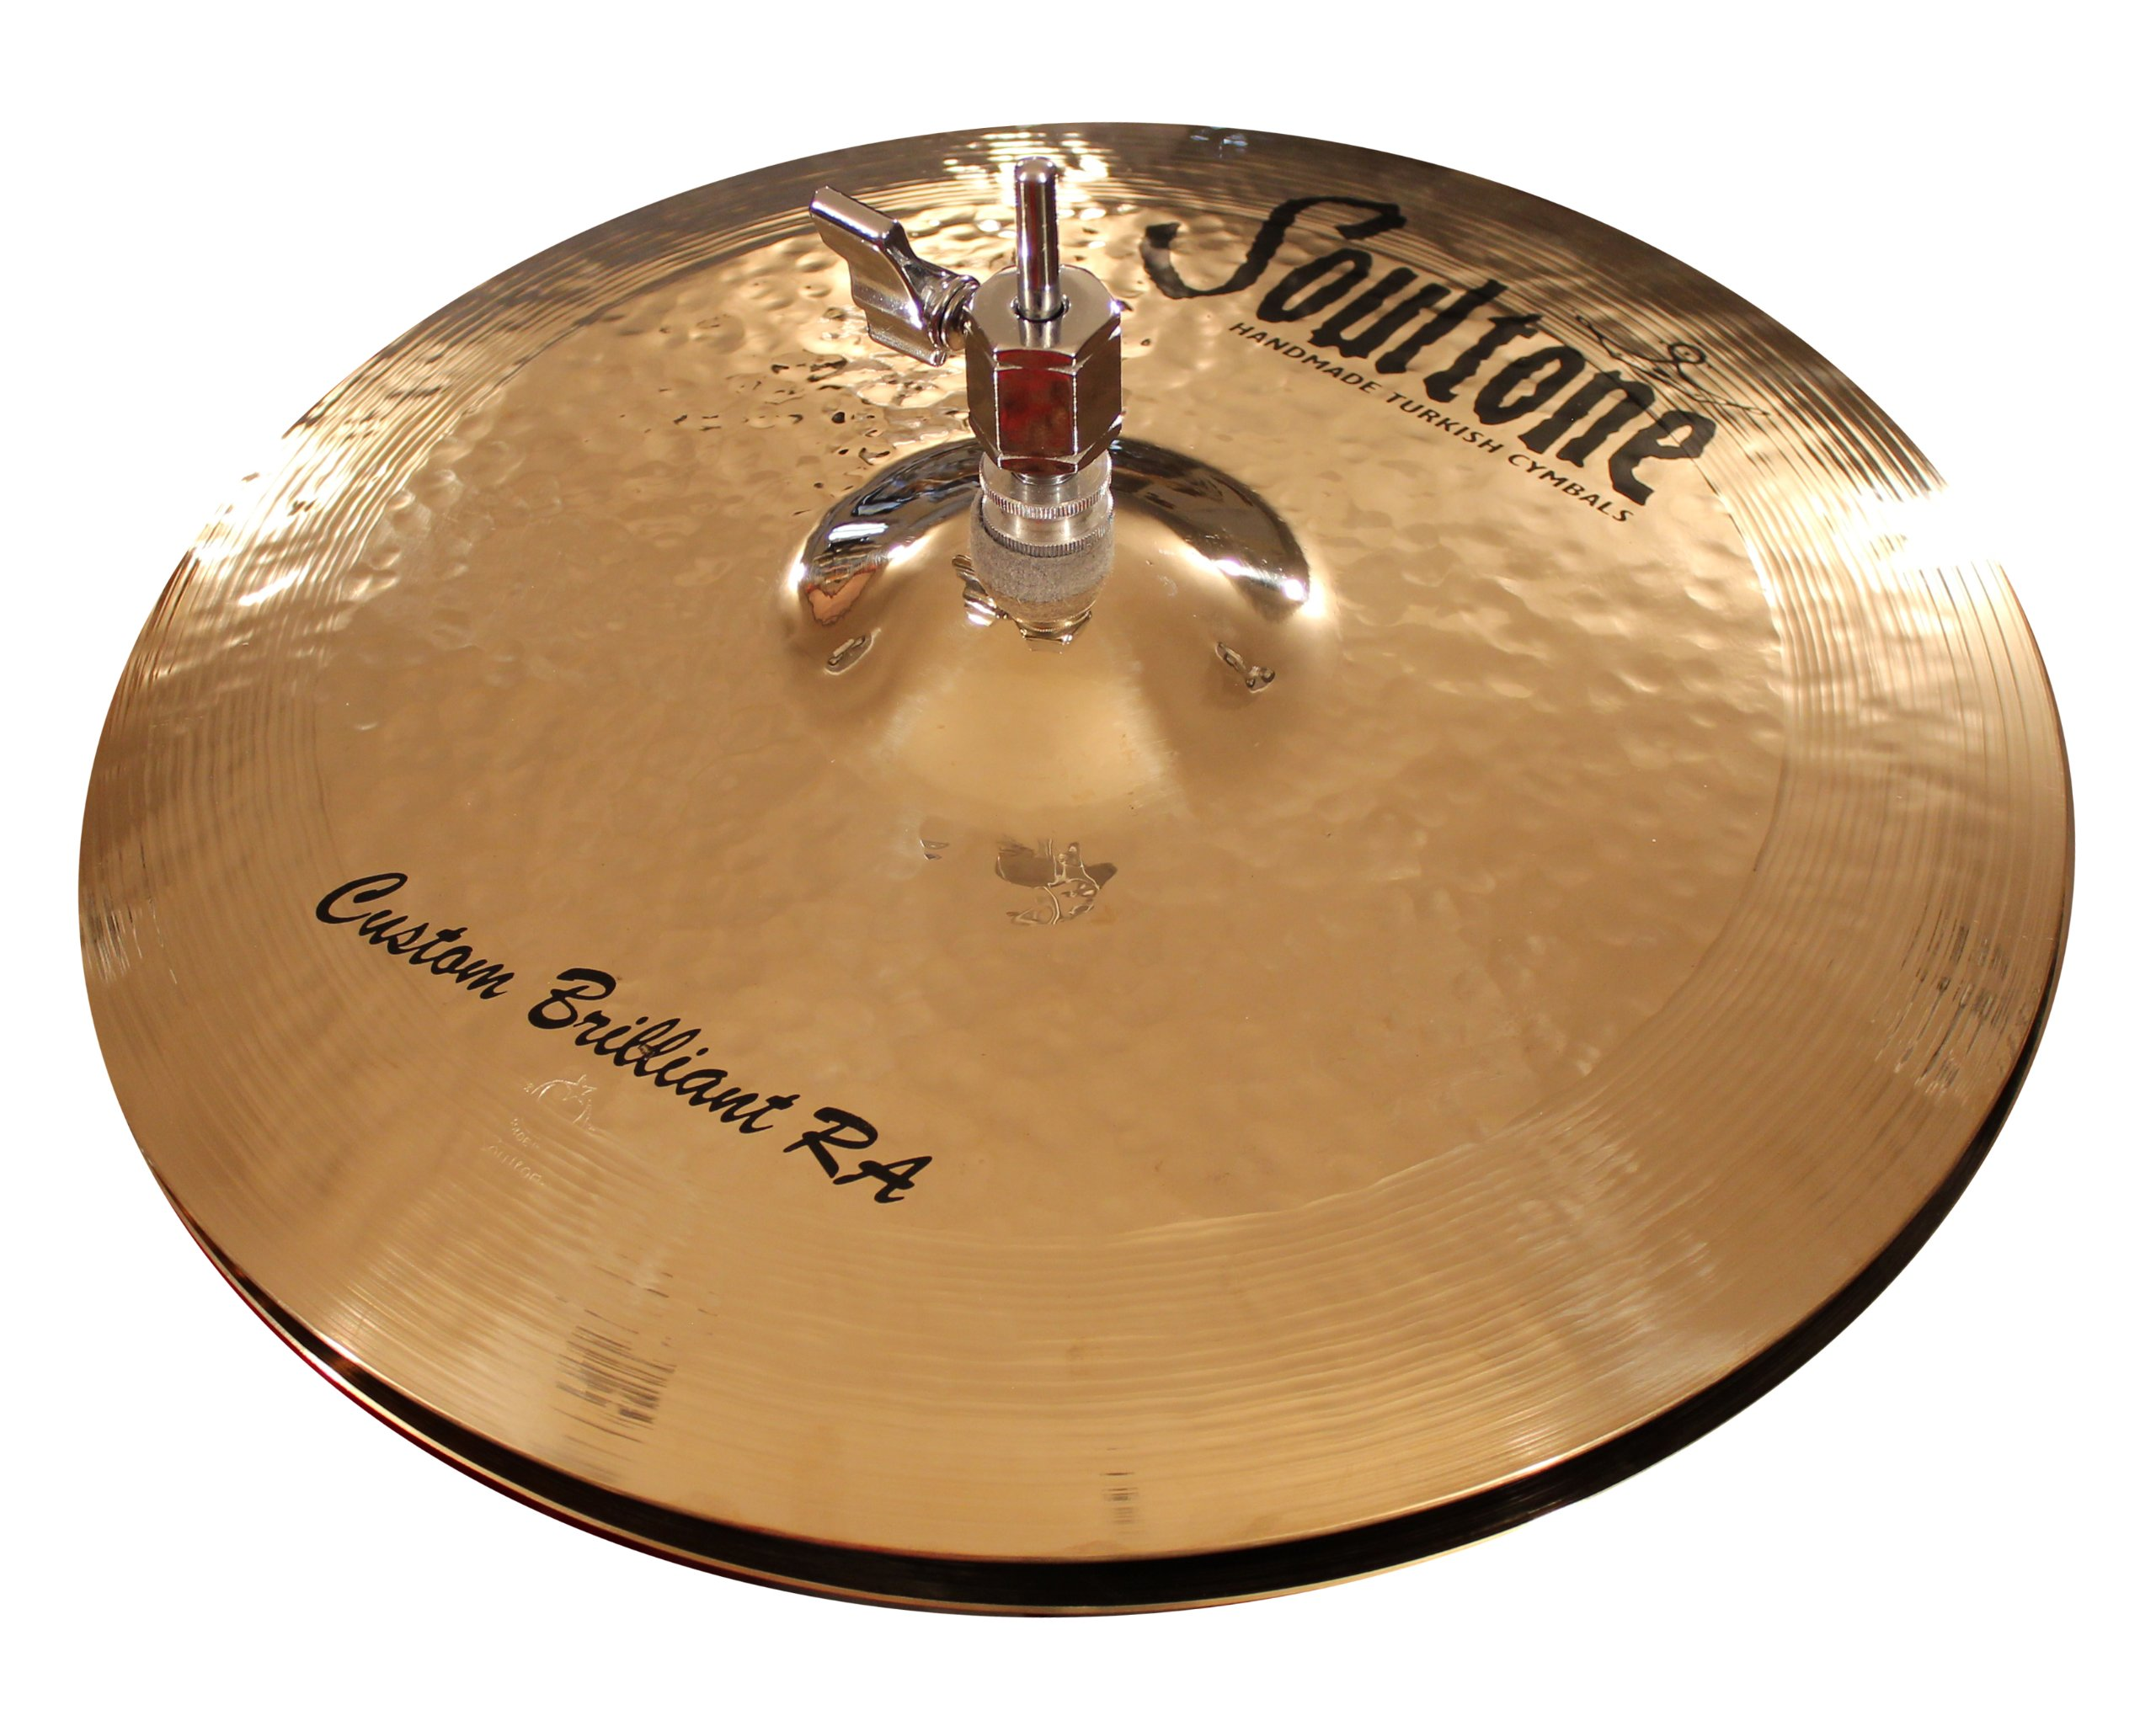 Soultone Cymbals CBRRA-HHTB08-08'' Custom Brilliant RA Hi Hat Bottom Only by Soultone Cymbals